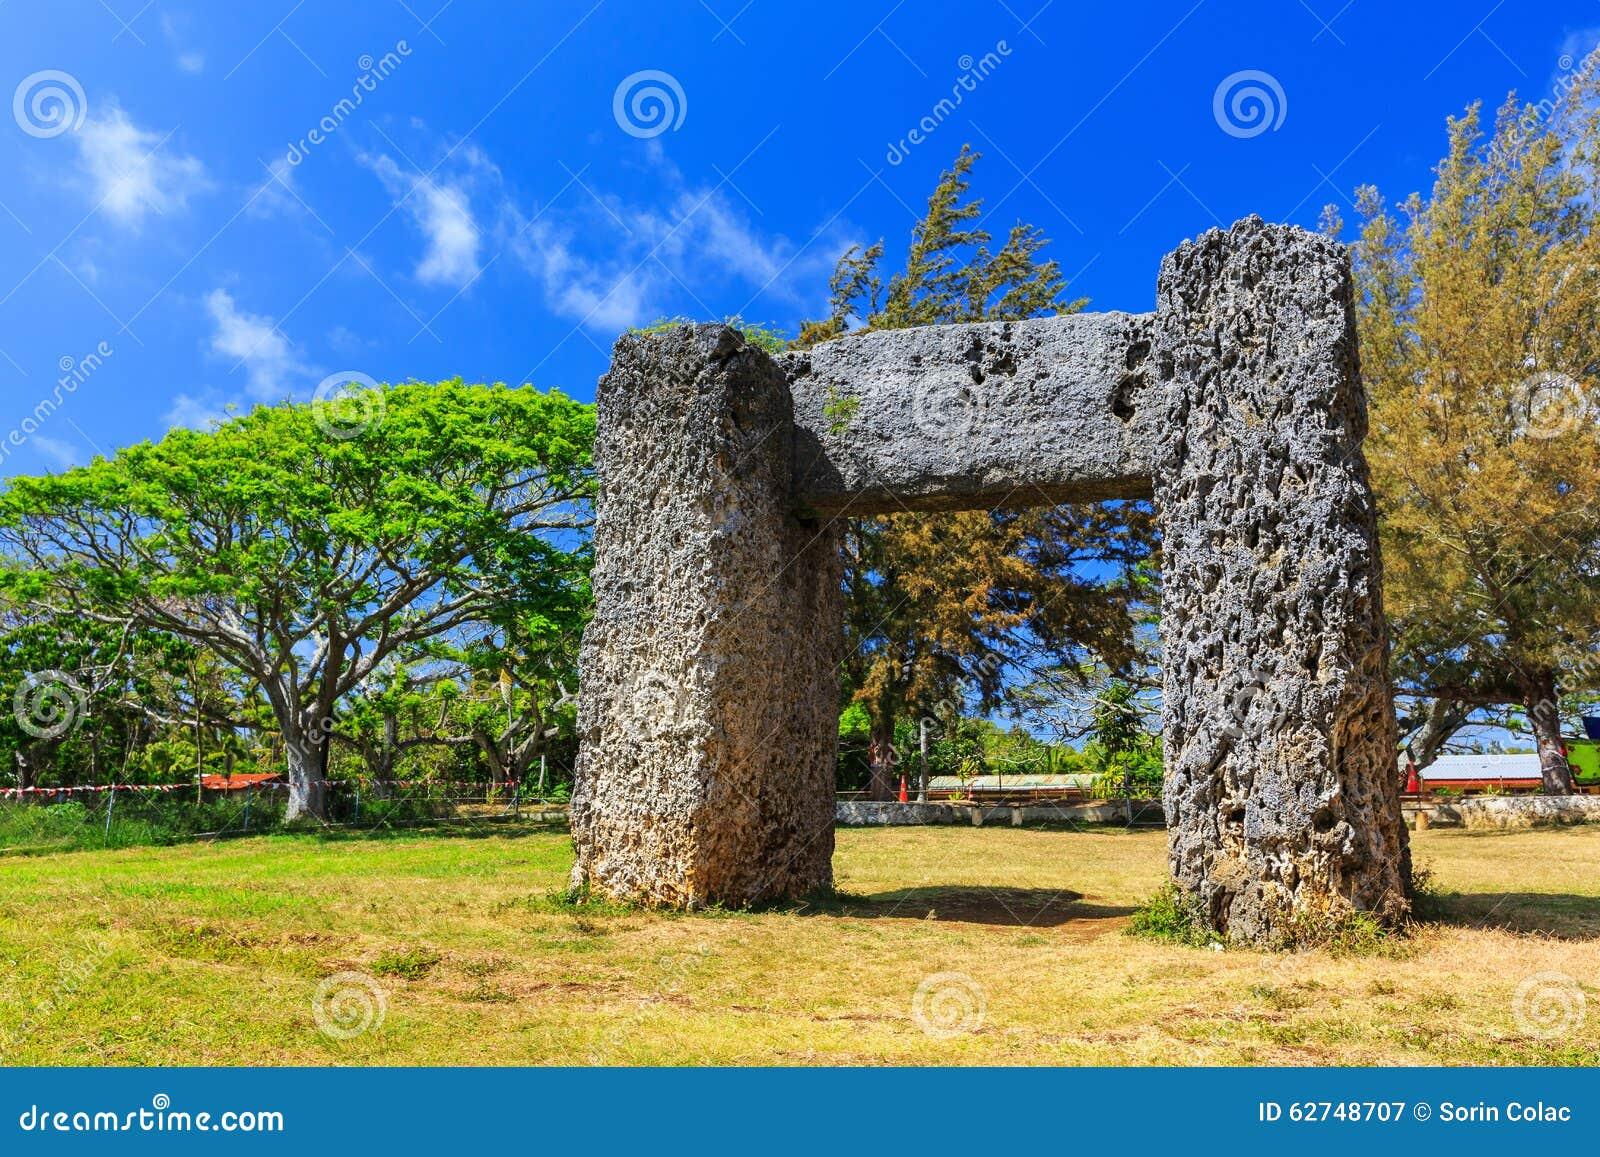 Nuku alofa, królestwo Tonga